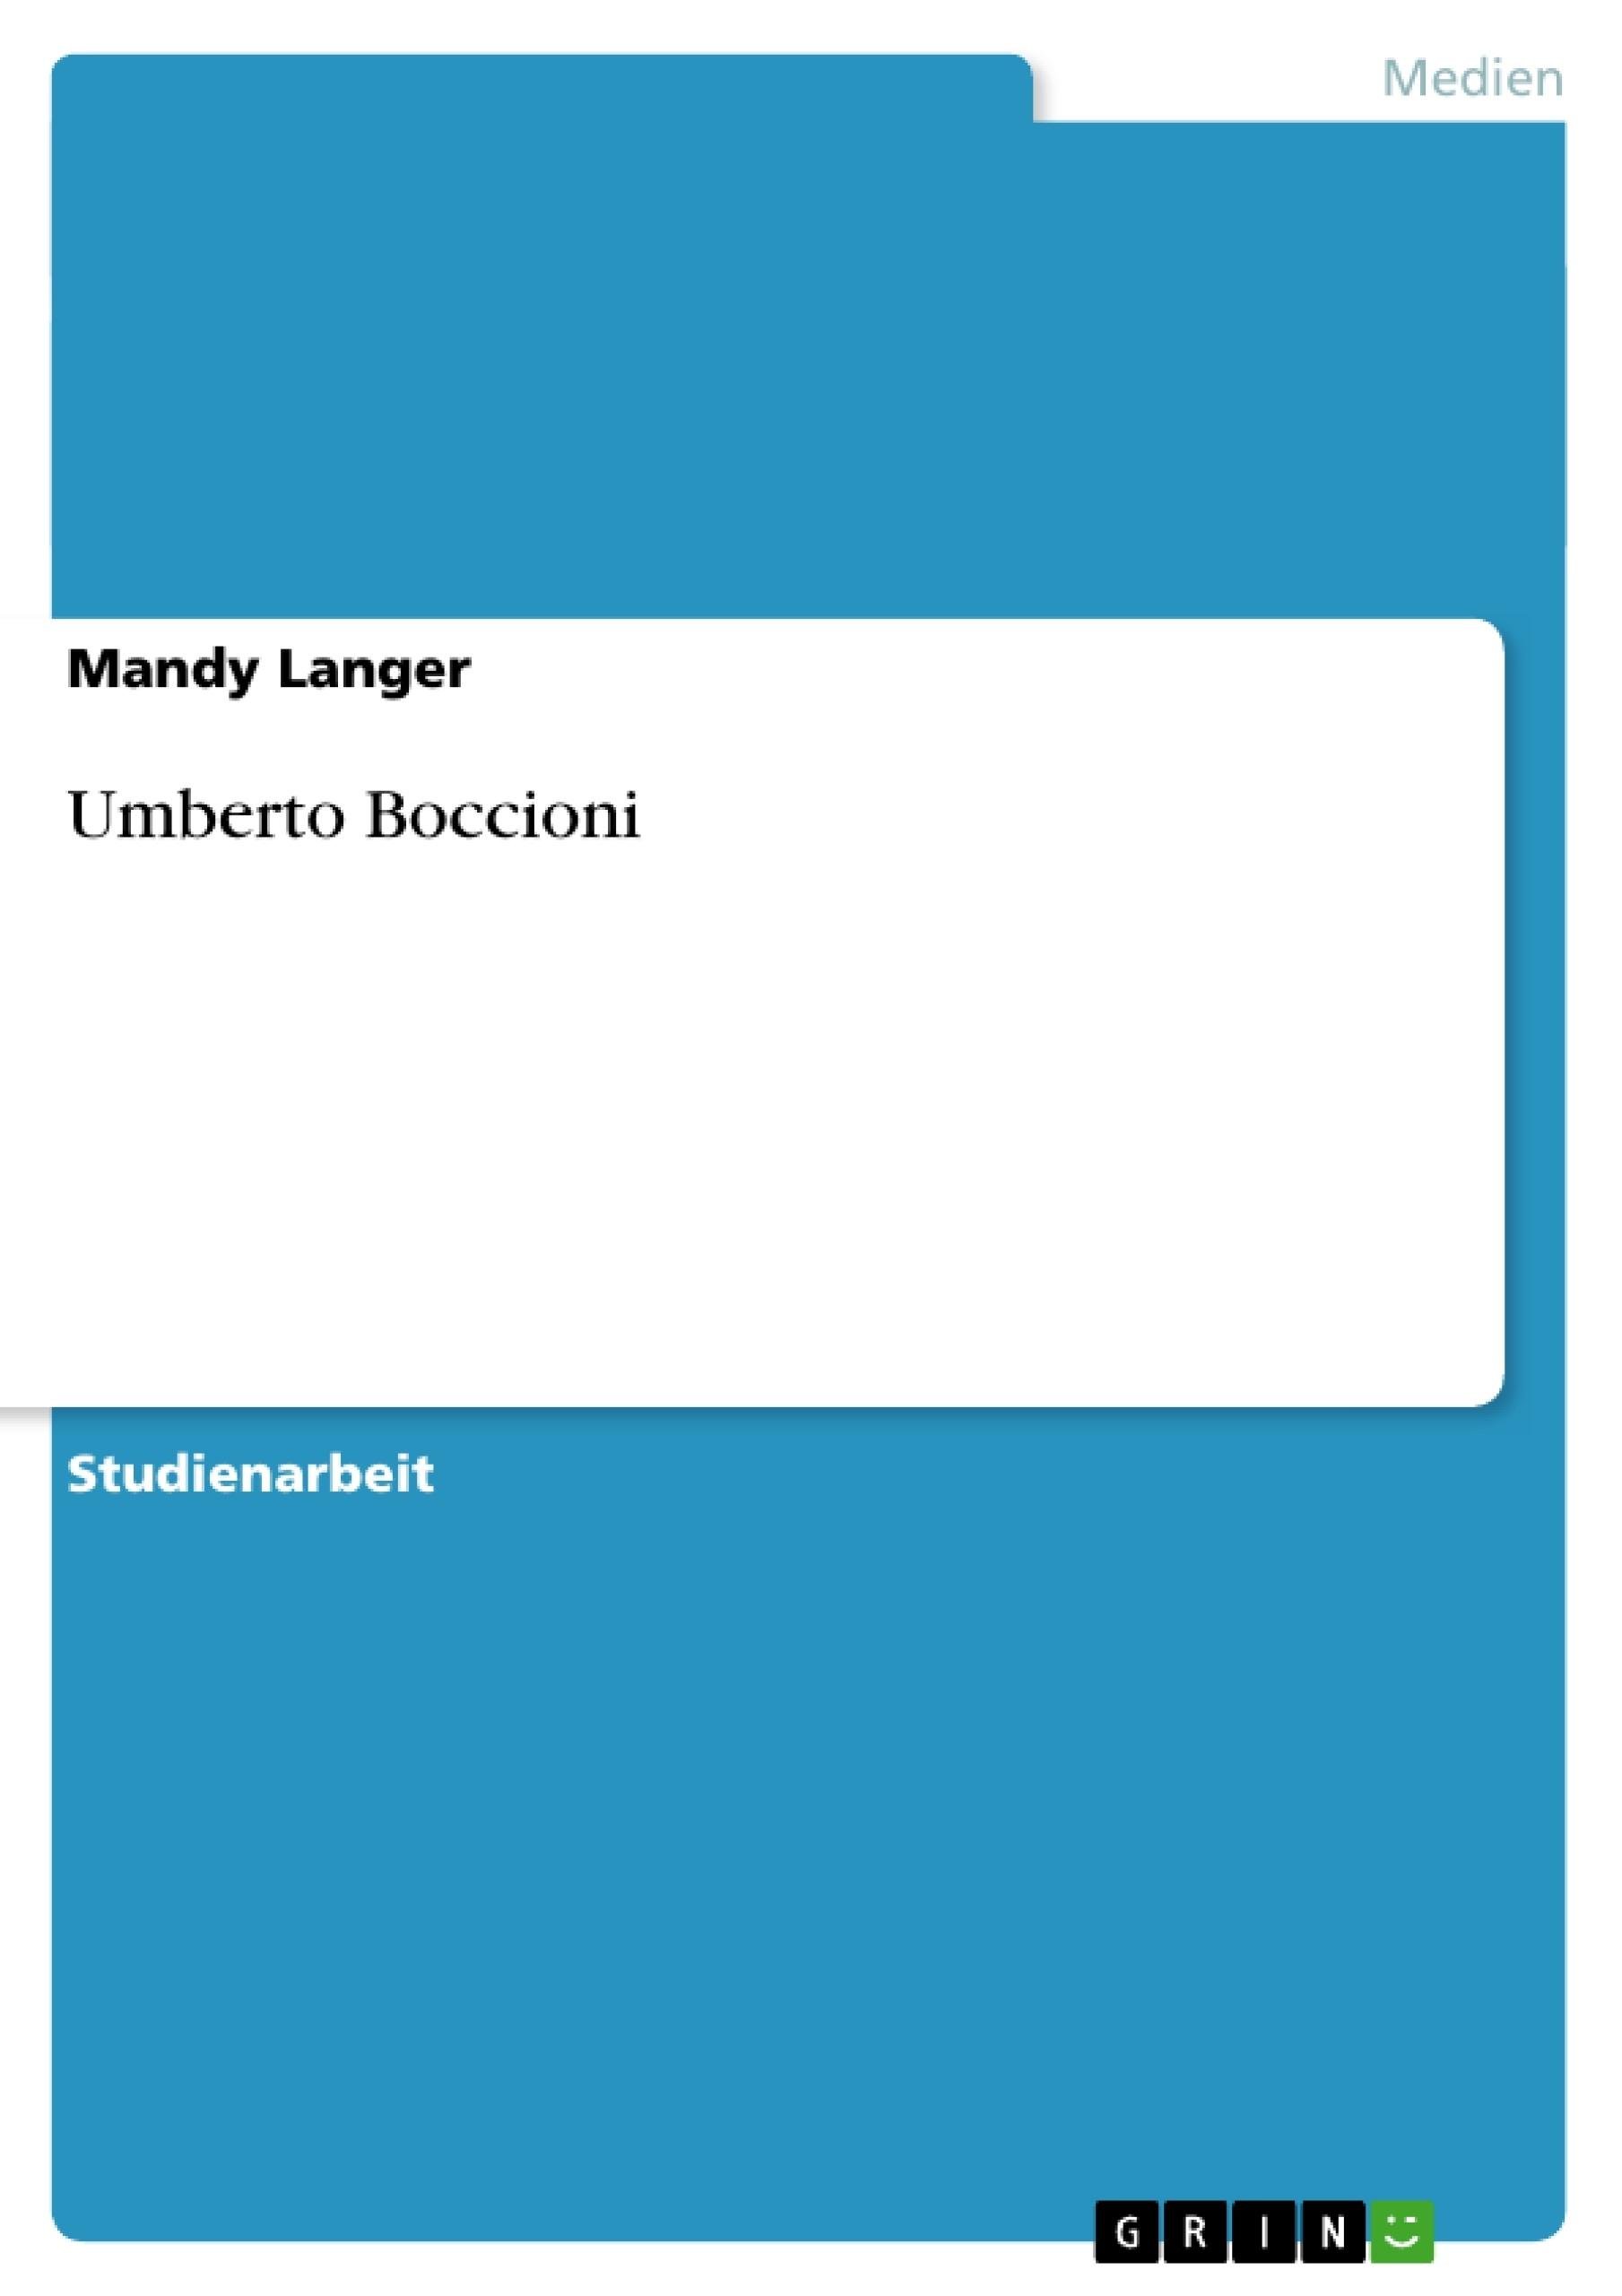 Titel: Umberto Boccioni und der Futurismus